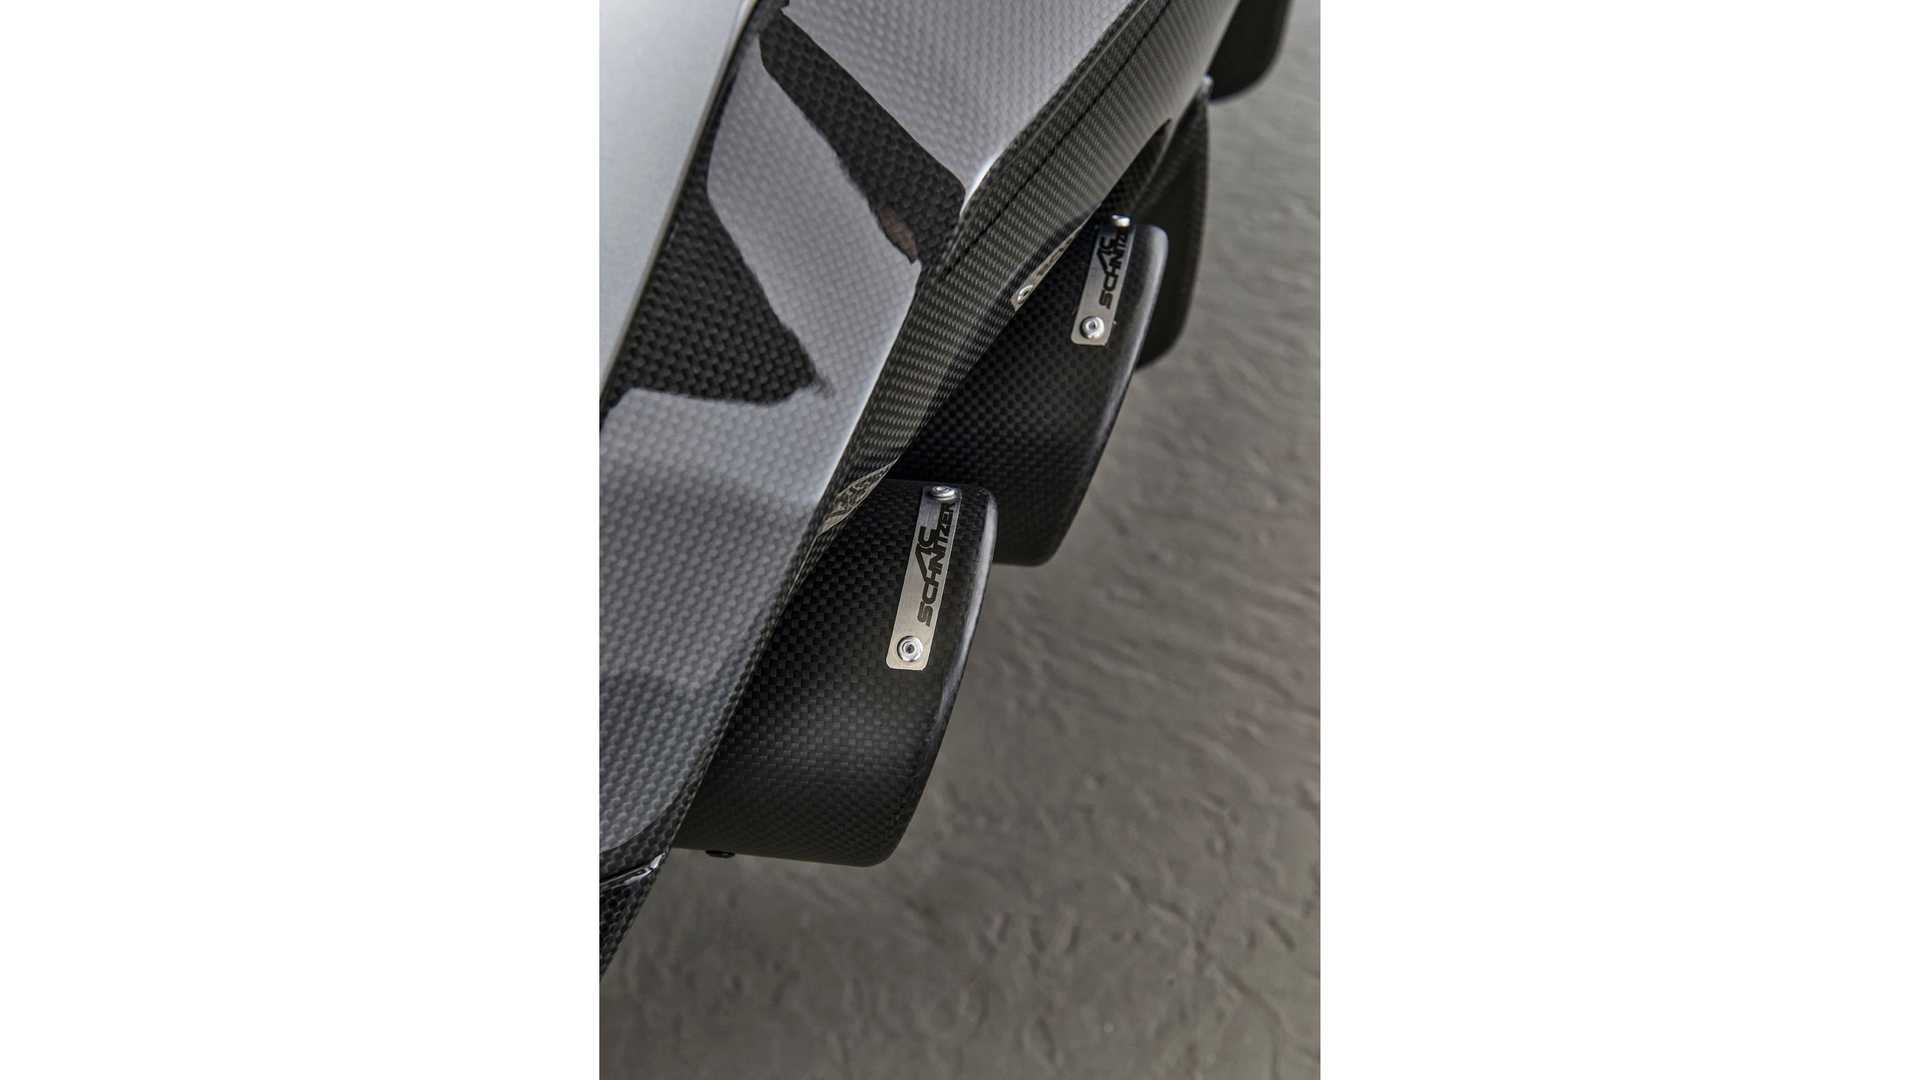 BMW-M850i-police-car-tune-it-safe-39